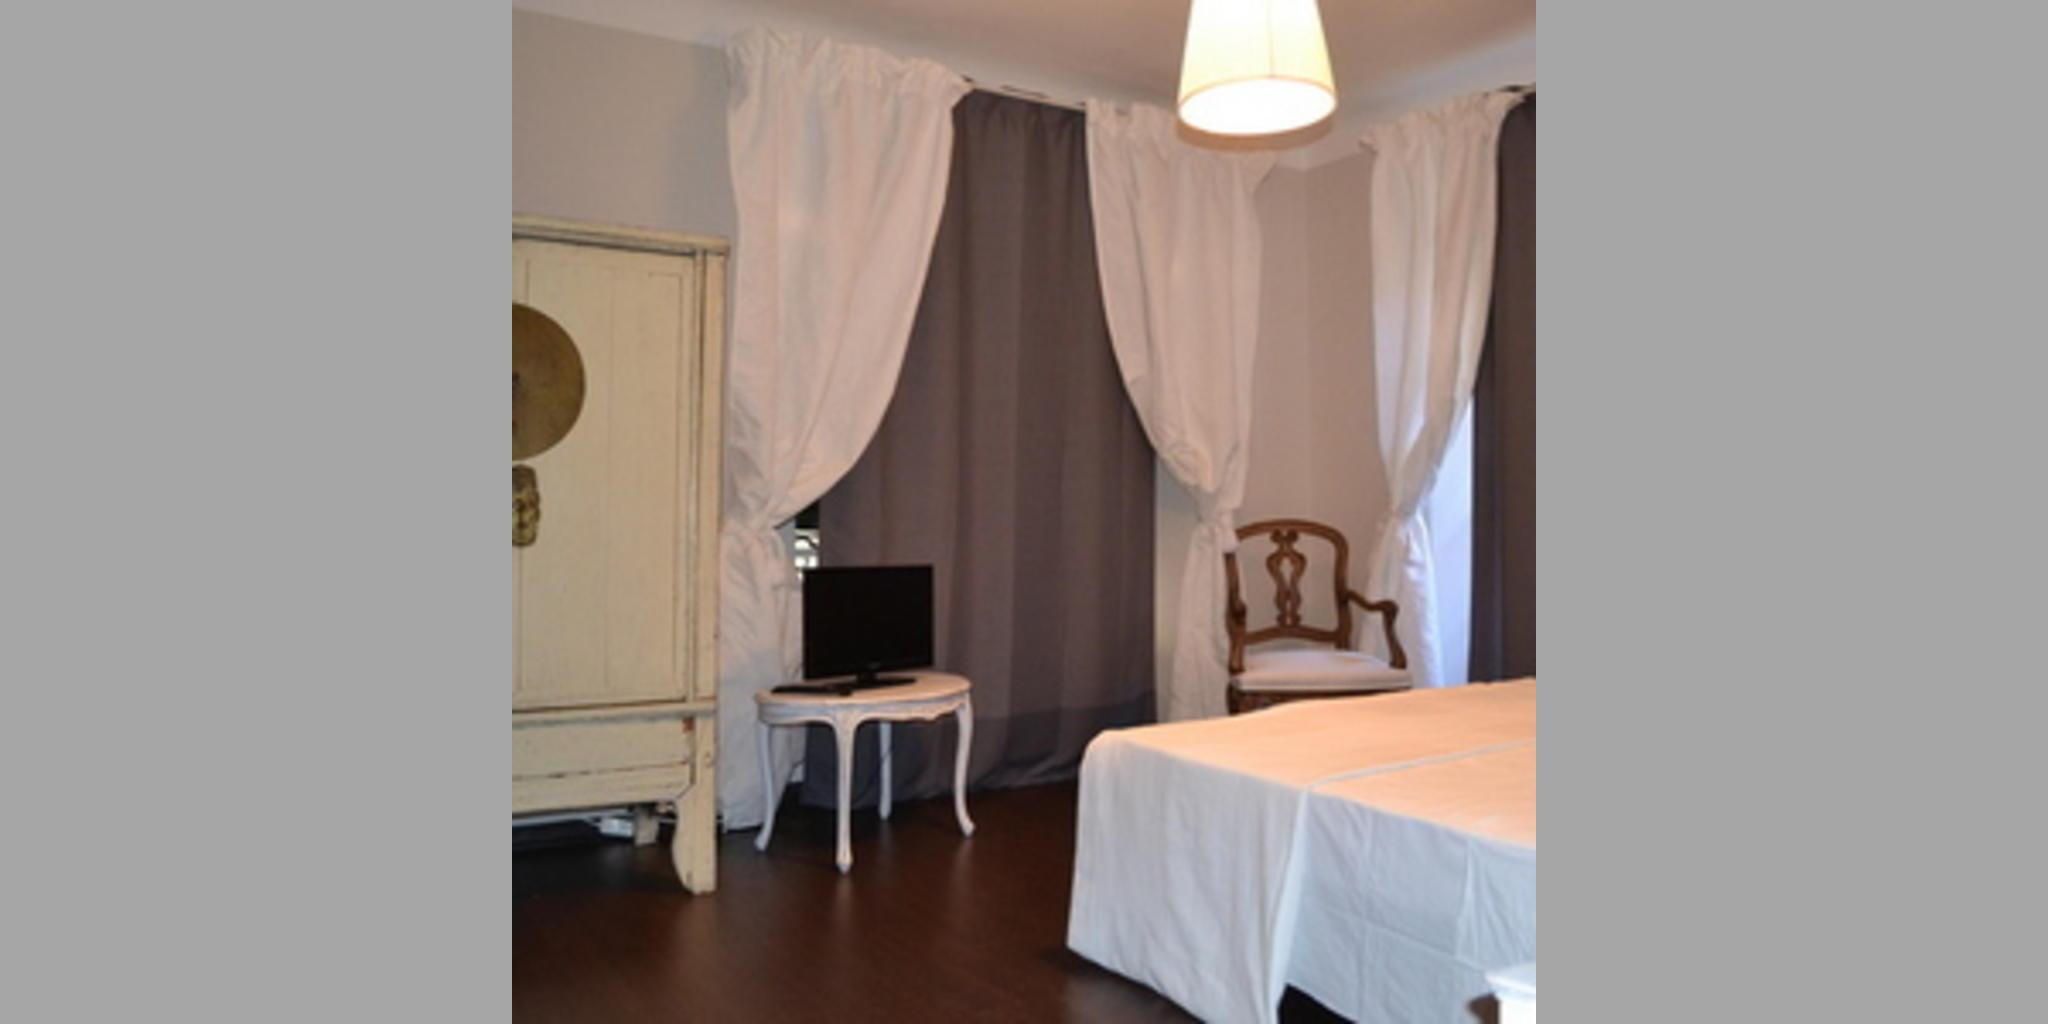 Bed & Breakfast Genova - Centralissimo In Palazzo Storico